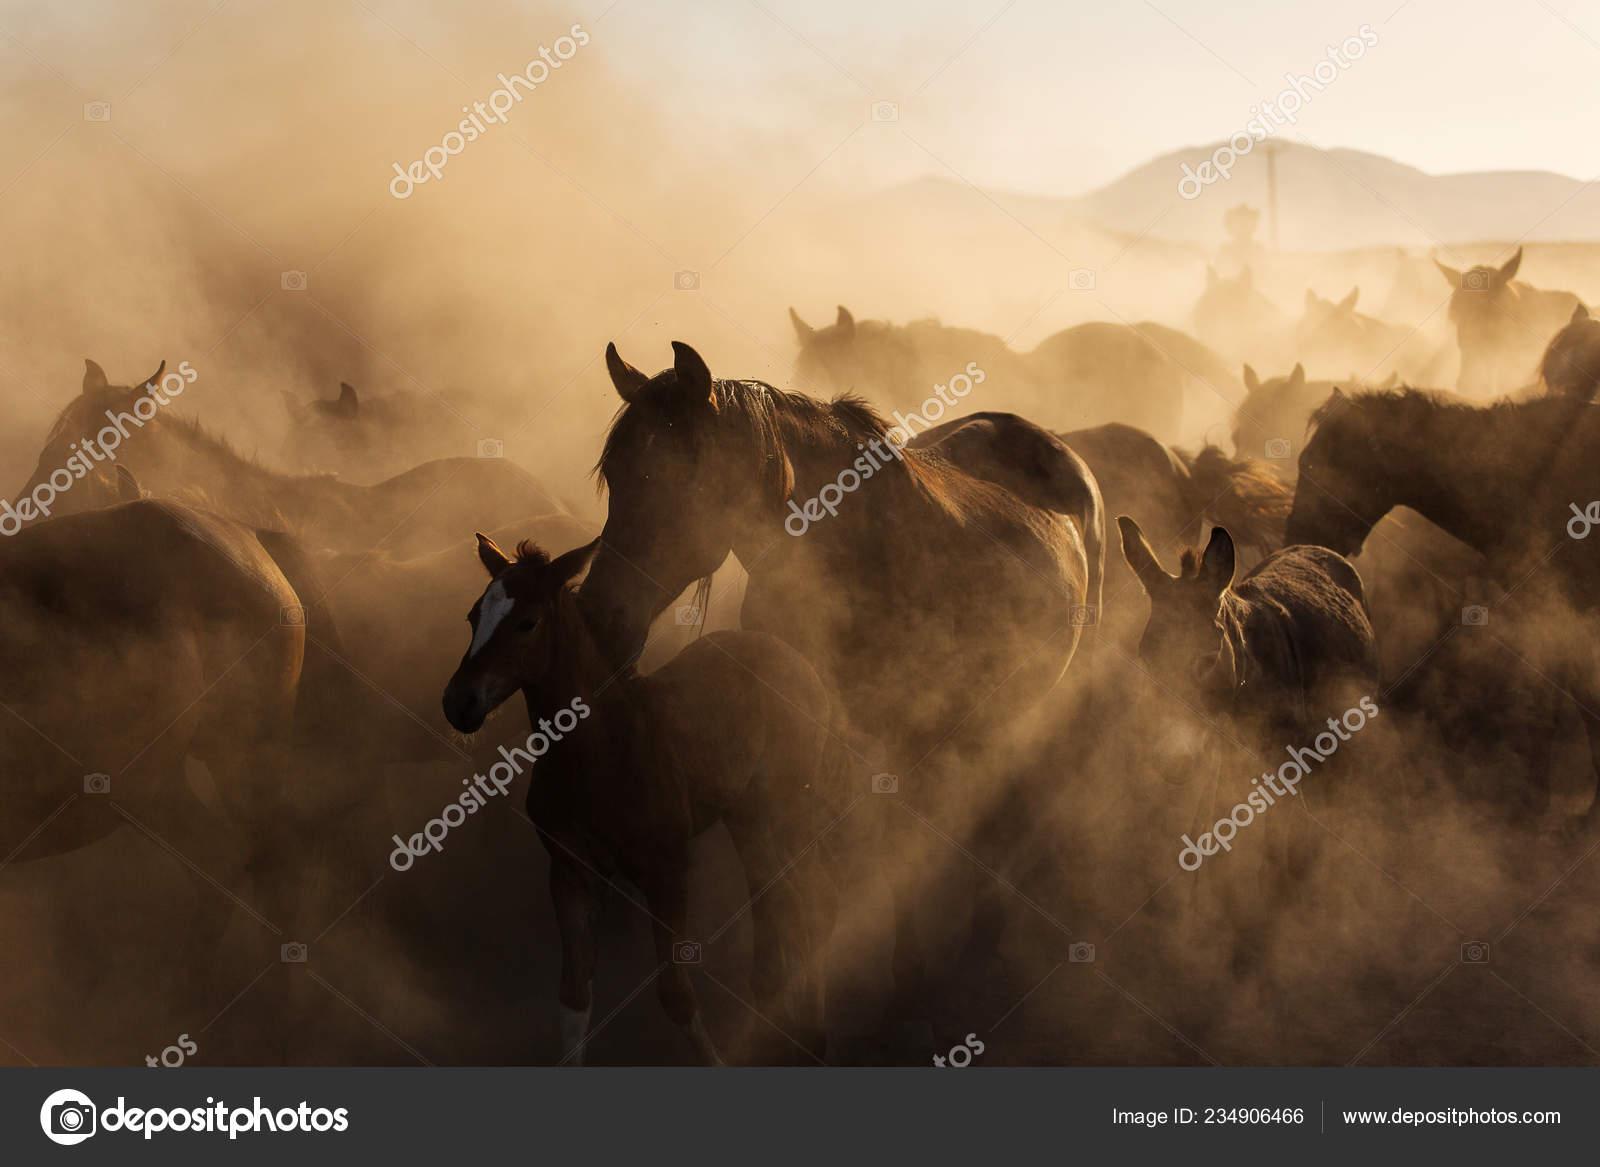 Landscape Wild Horses Running Sunset Dust Background Stock Photo C Danmir12 234906466